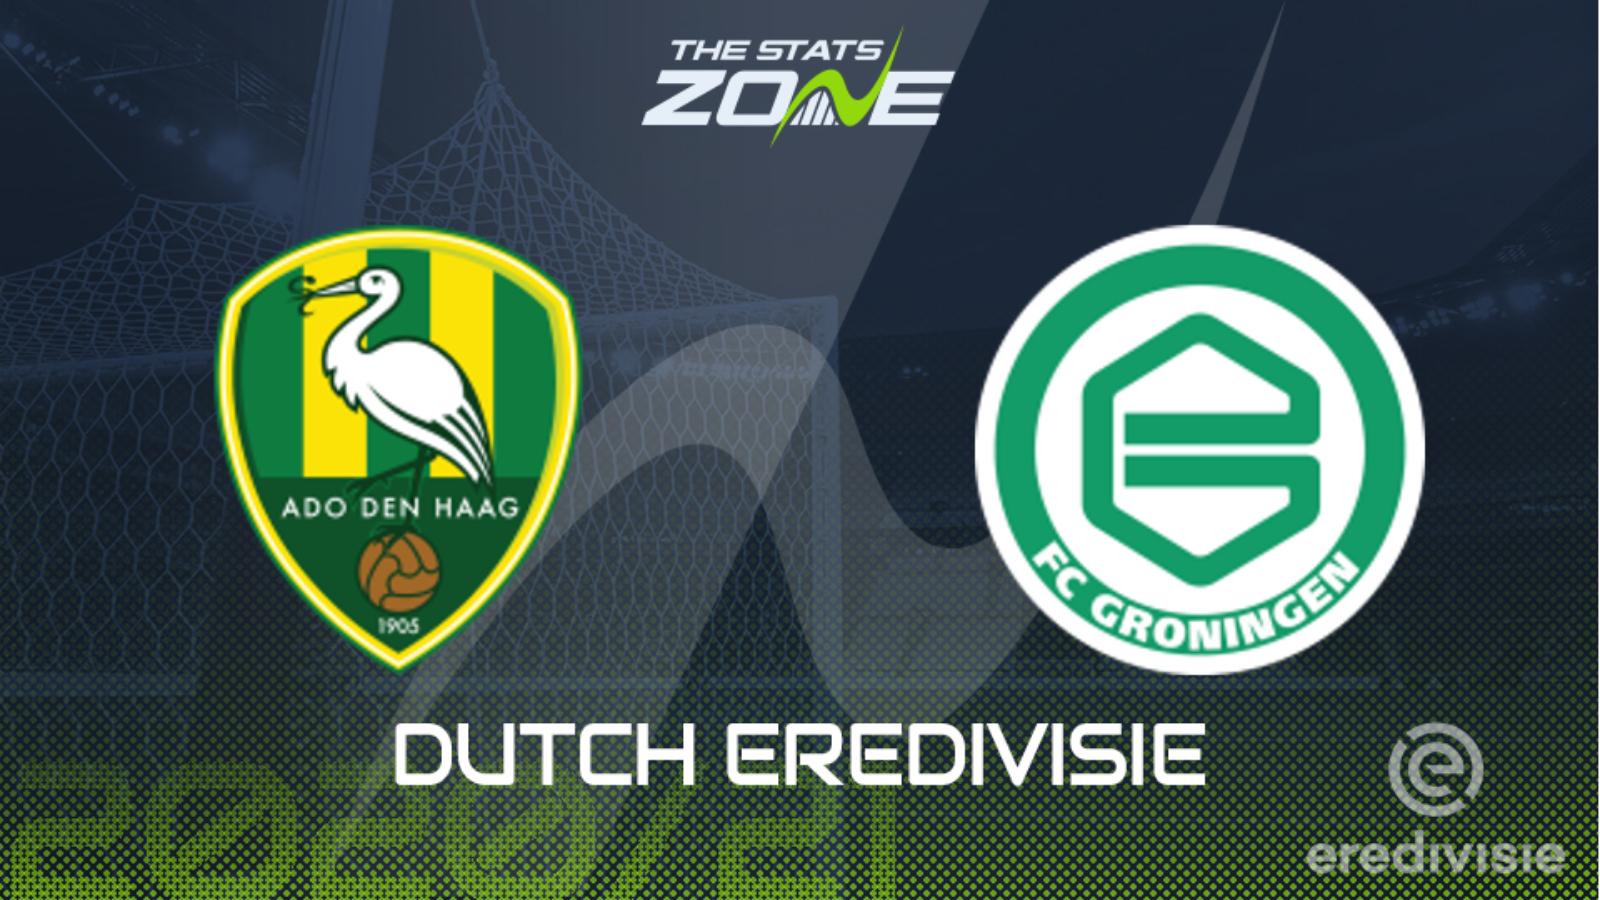 2020 21 Eredivisie Ado Den Haag Vs Groningen Preview Prediction The Stats Zone